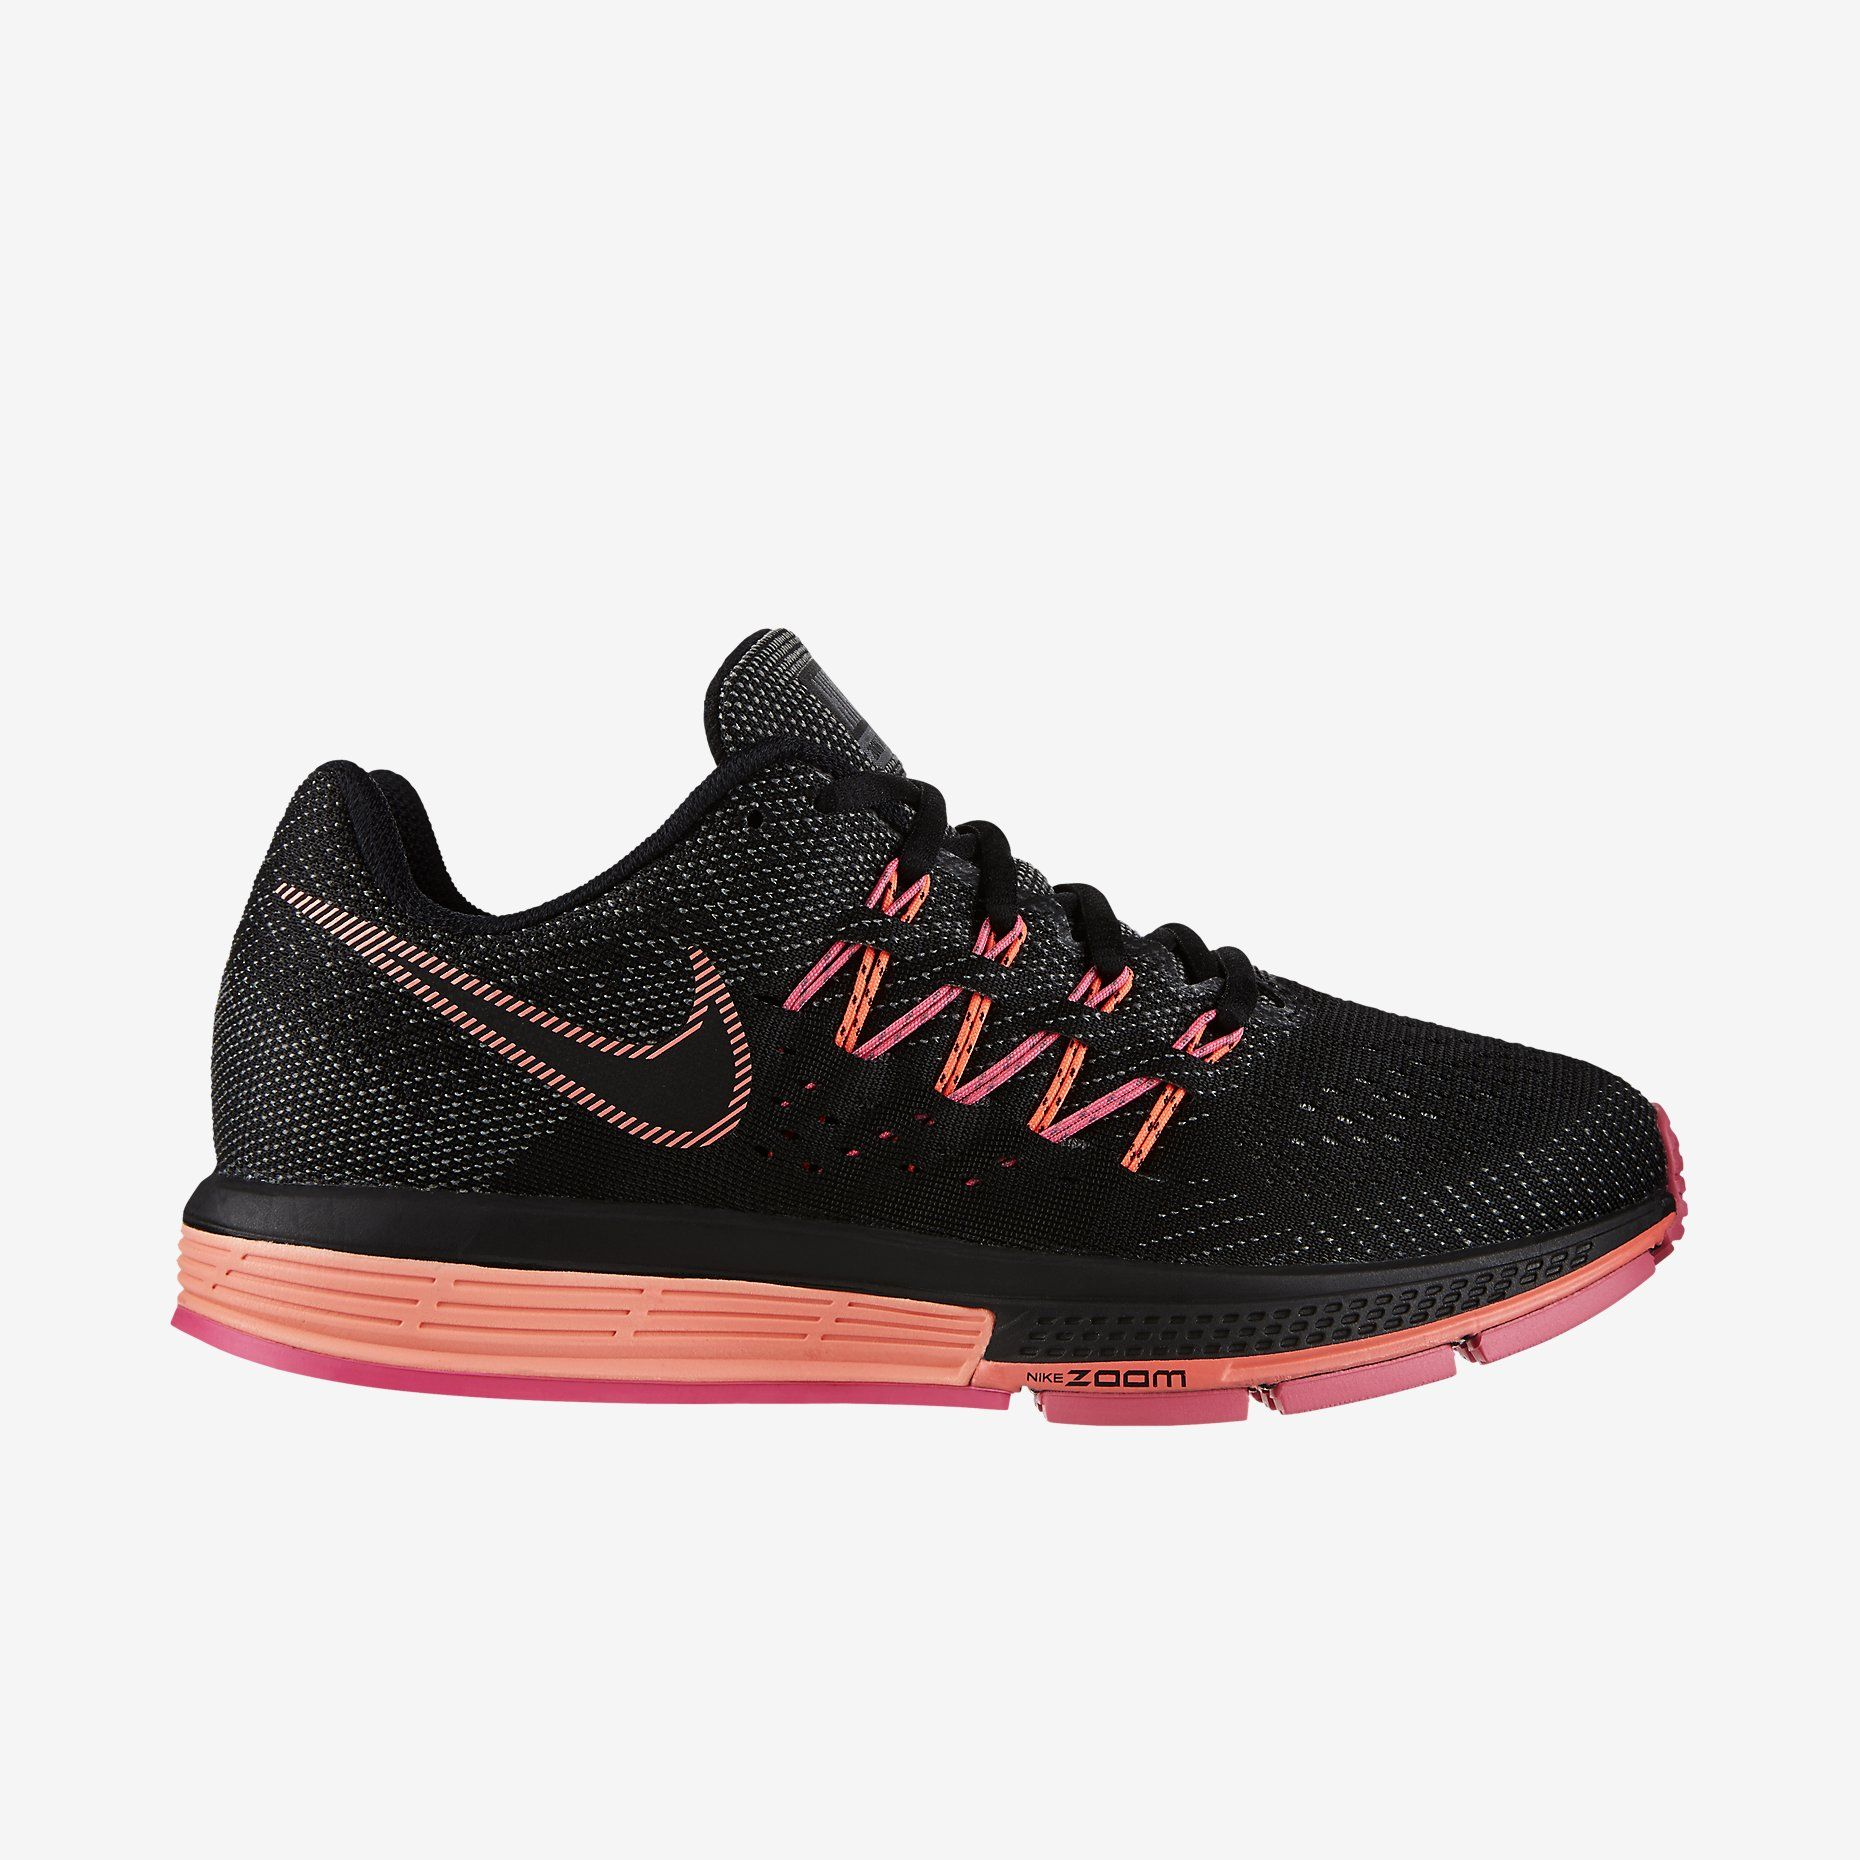 Acquista scarpe, abbigliamento e accessori Nike su www.nike.com · Running  Shoes NikeWomen Running ShoesWoman ...